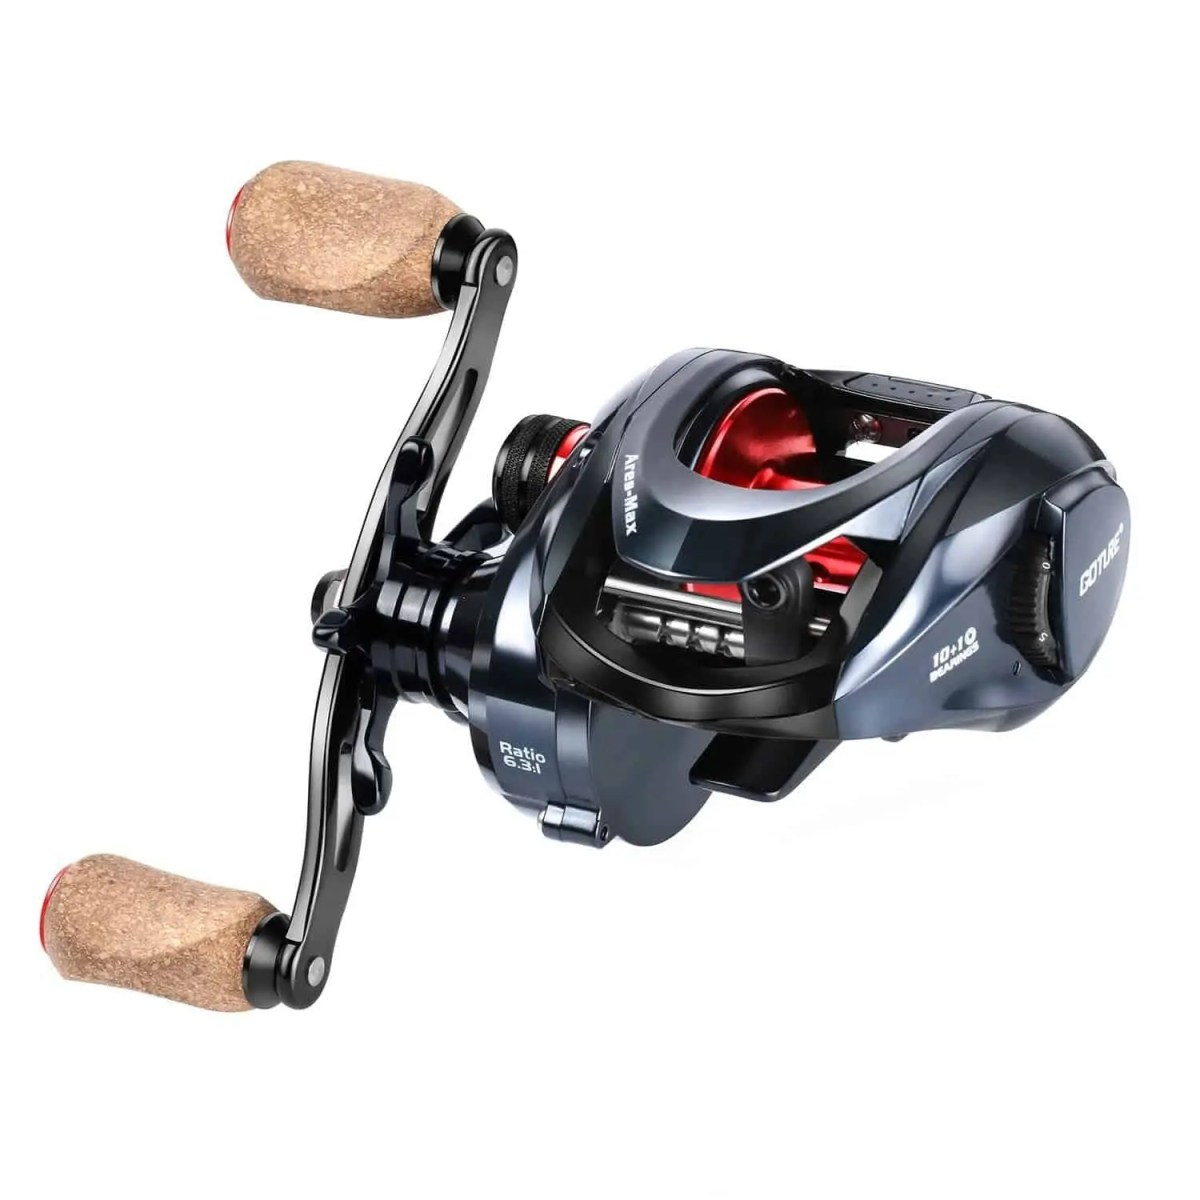 Goture Ares-Max Baitcasting Fishing Reel 22LB Carbon Fiber Drag